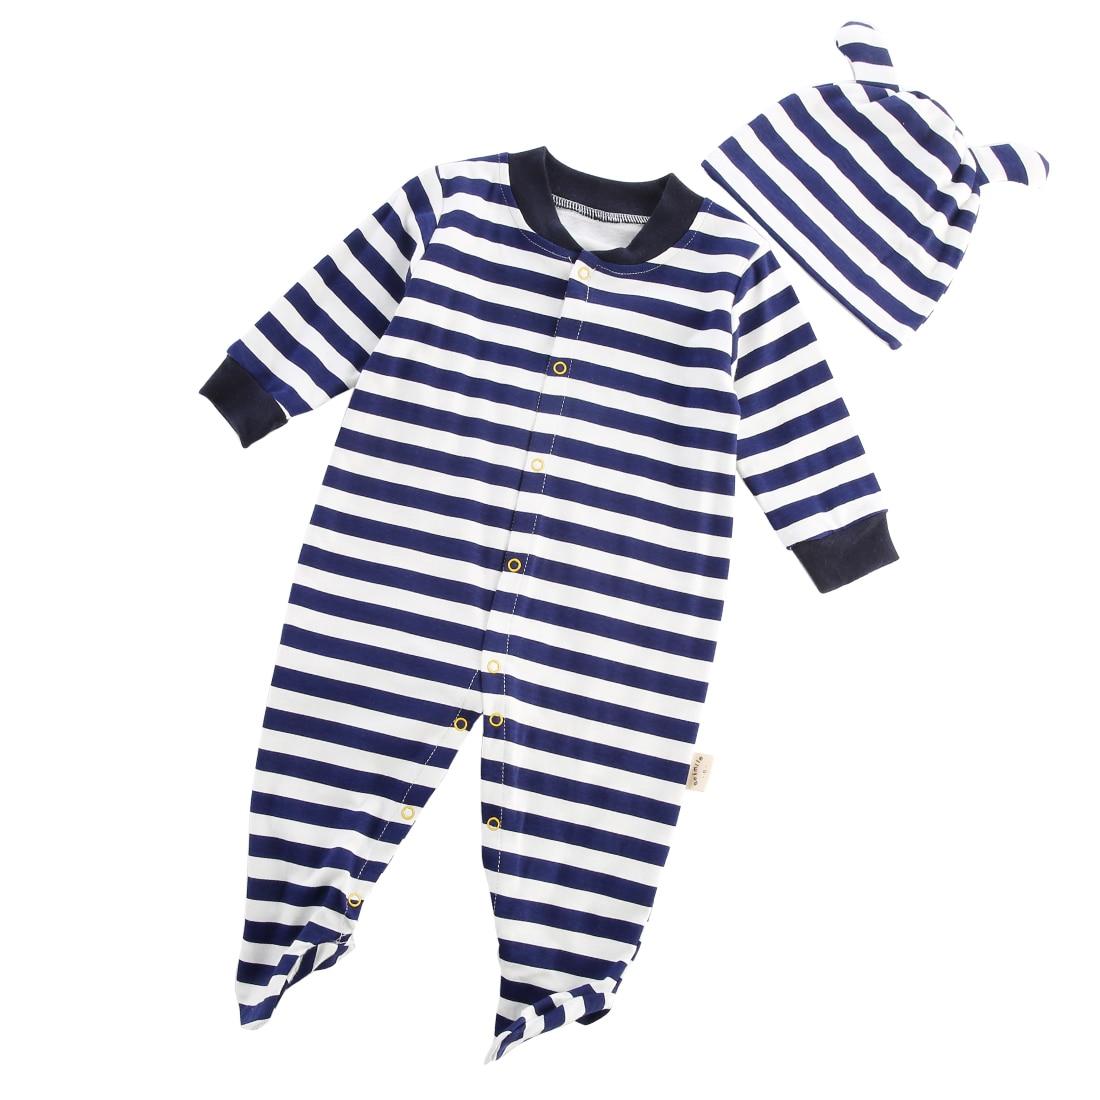 2pcs set !!Newborn Boys/Girls Polo Baby blue casual ...